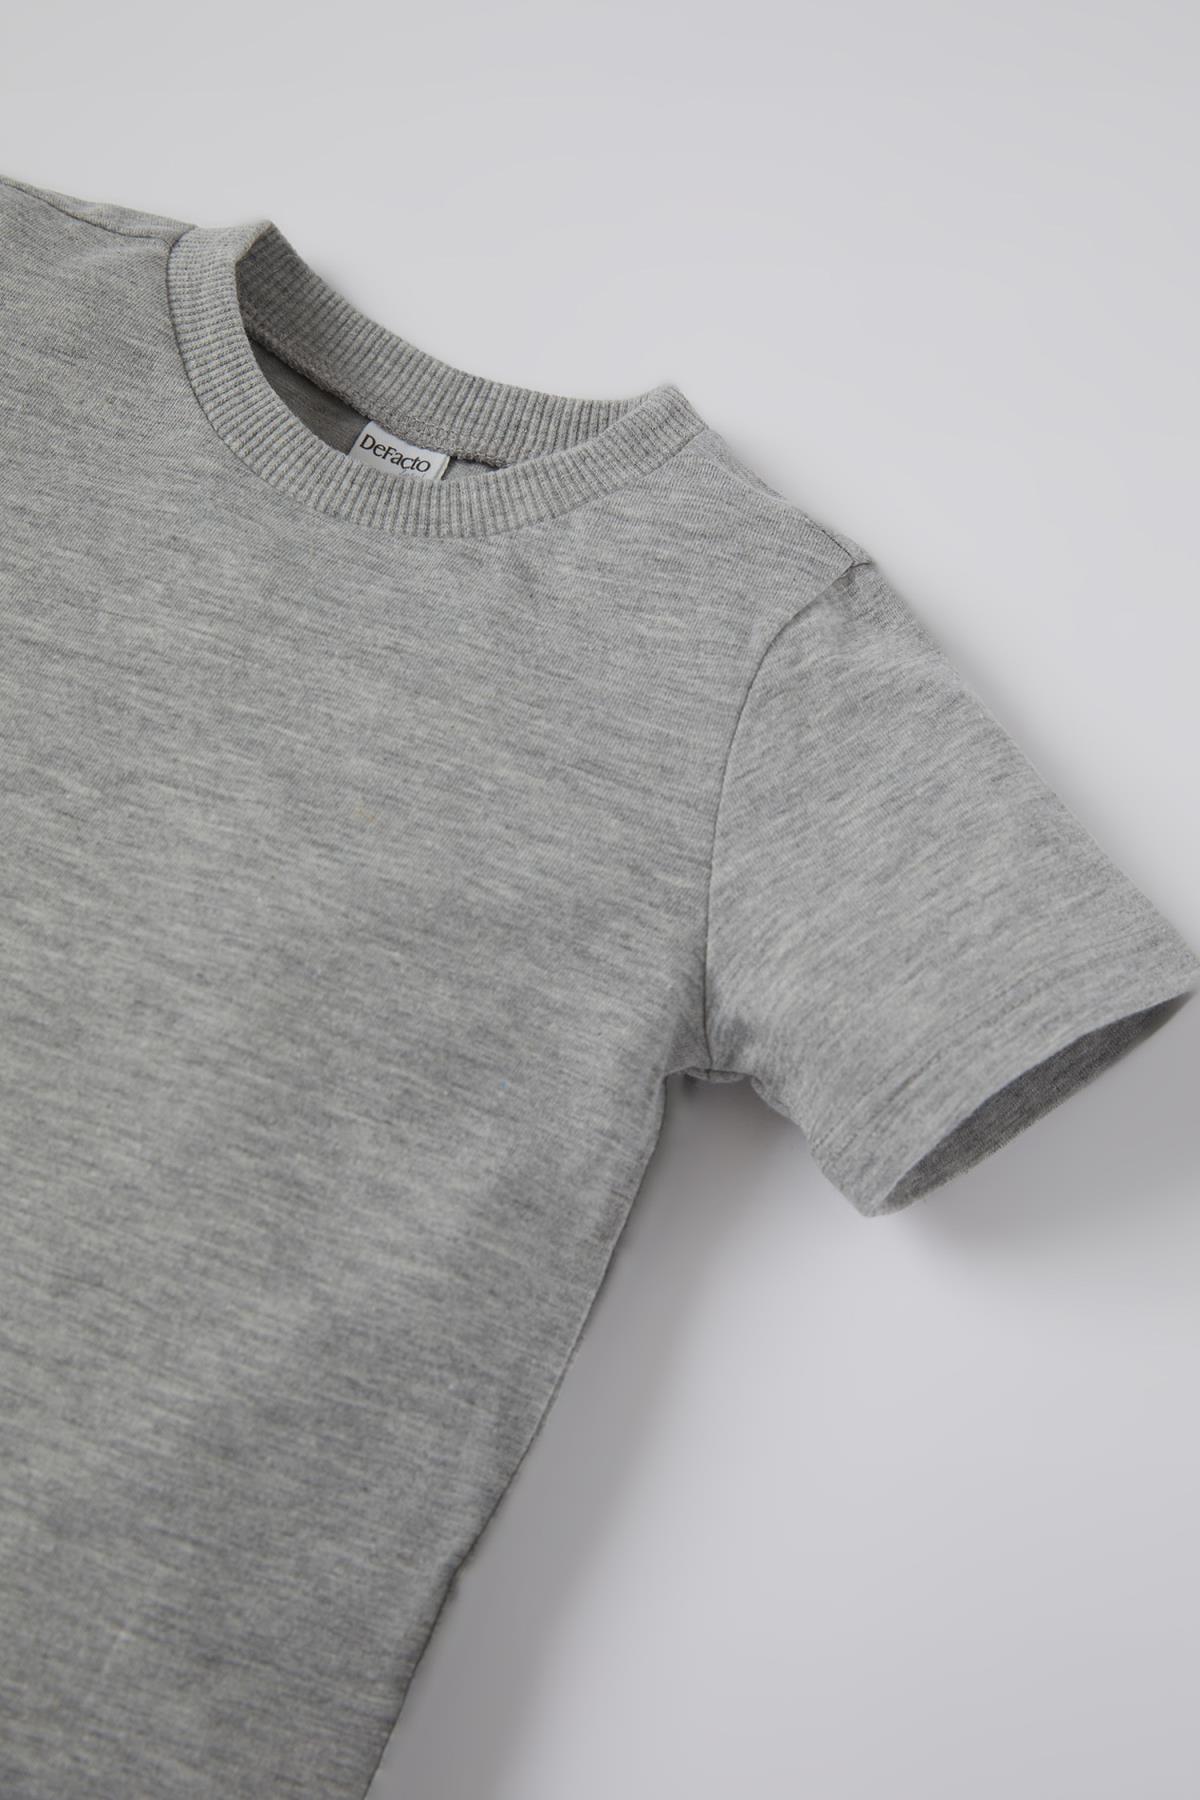 Defacto Erkek Bebek Basic 2'li Kısa Kol Pamuklu Tişört